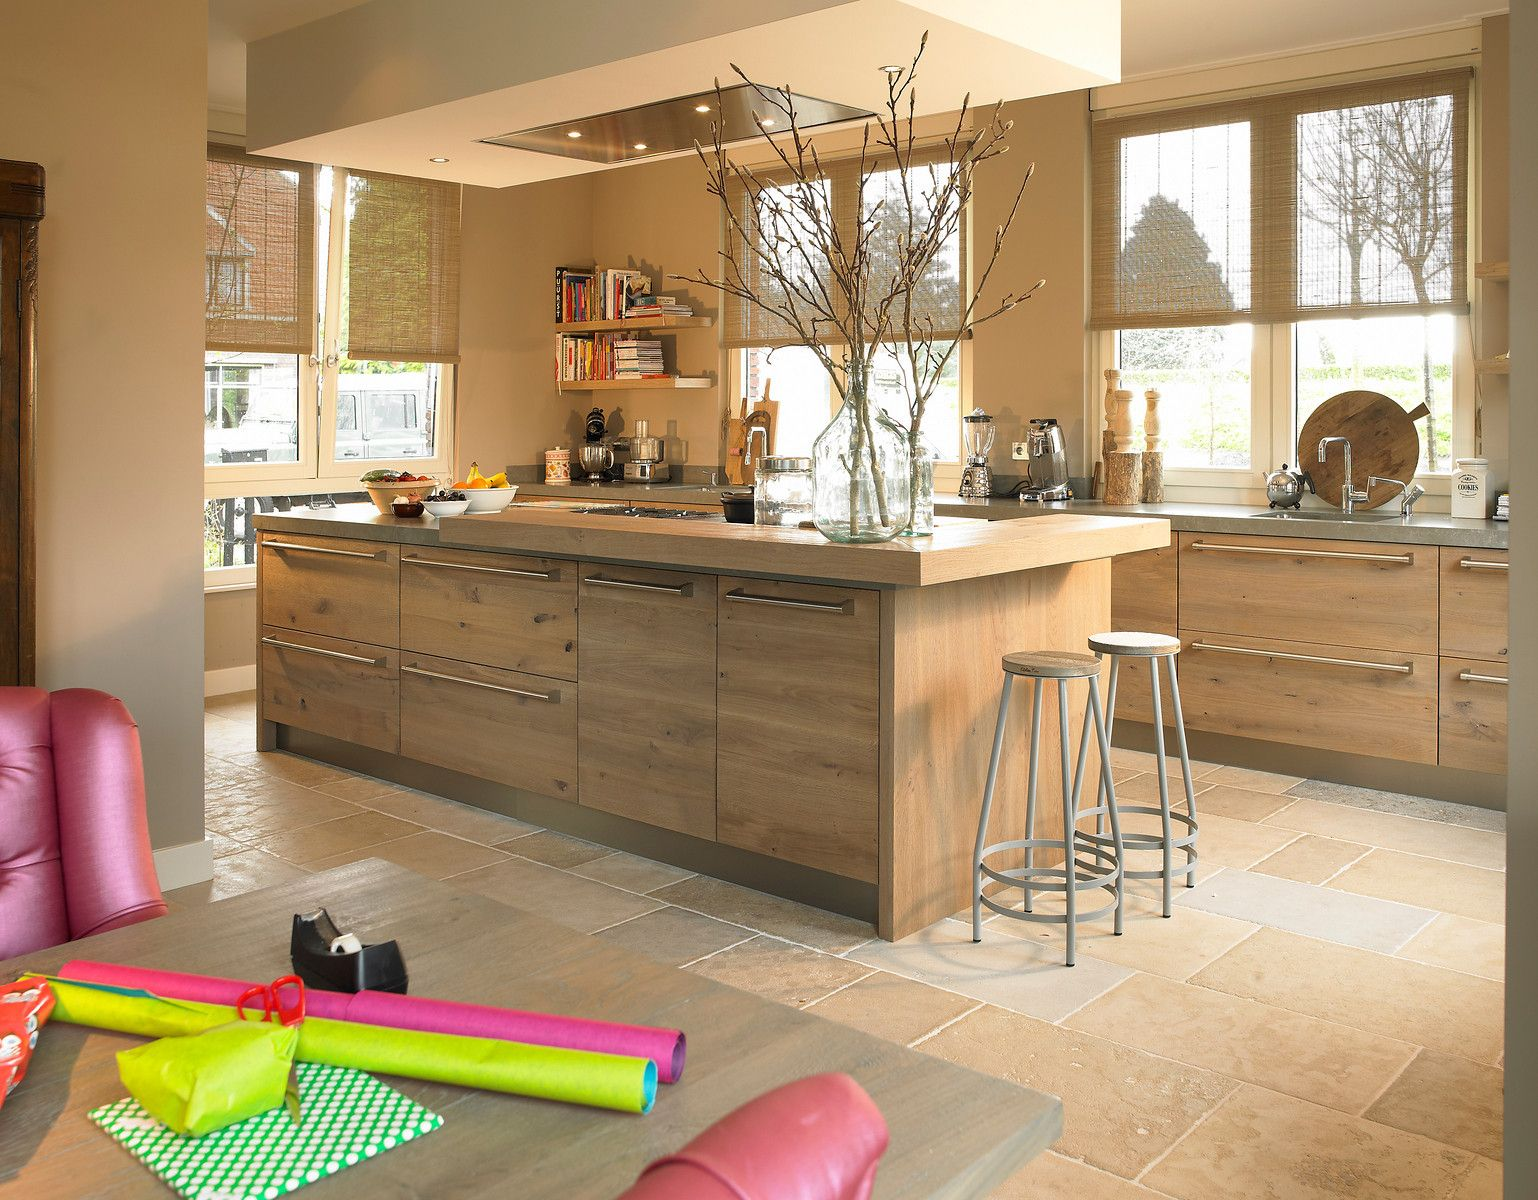 Kookeiland Keuken Houten : Houten keuken betonnen blad kookeiland met betonnen blad